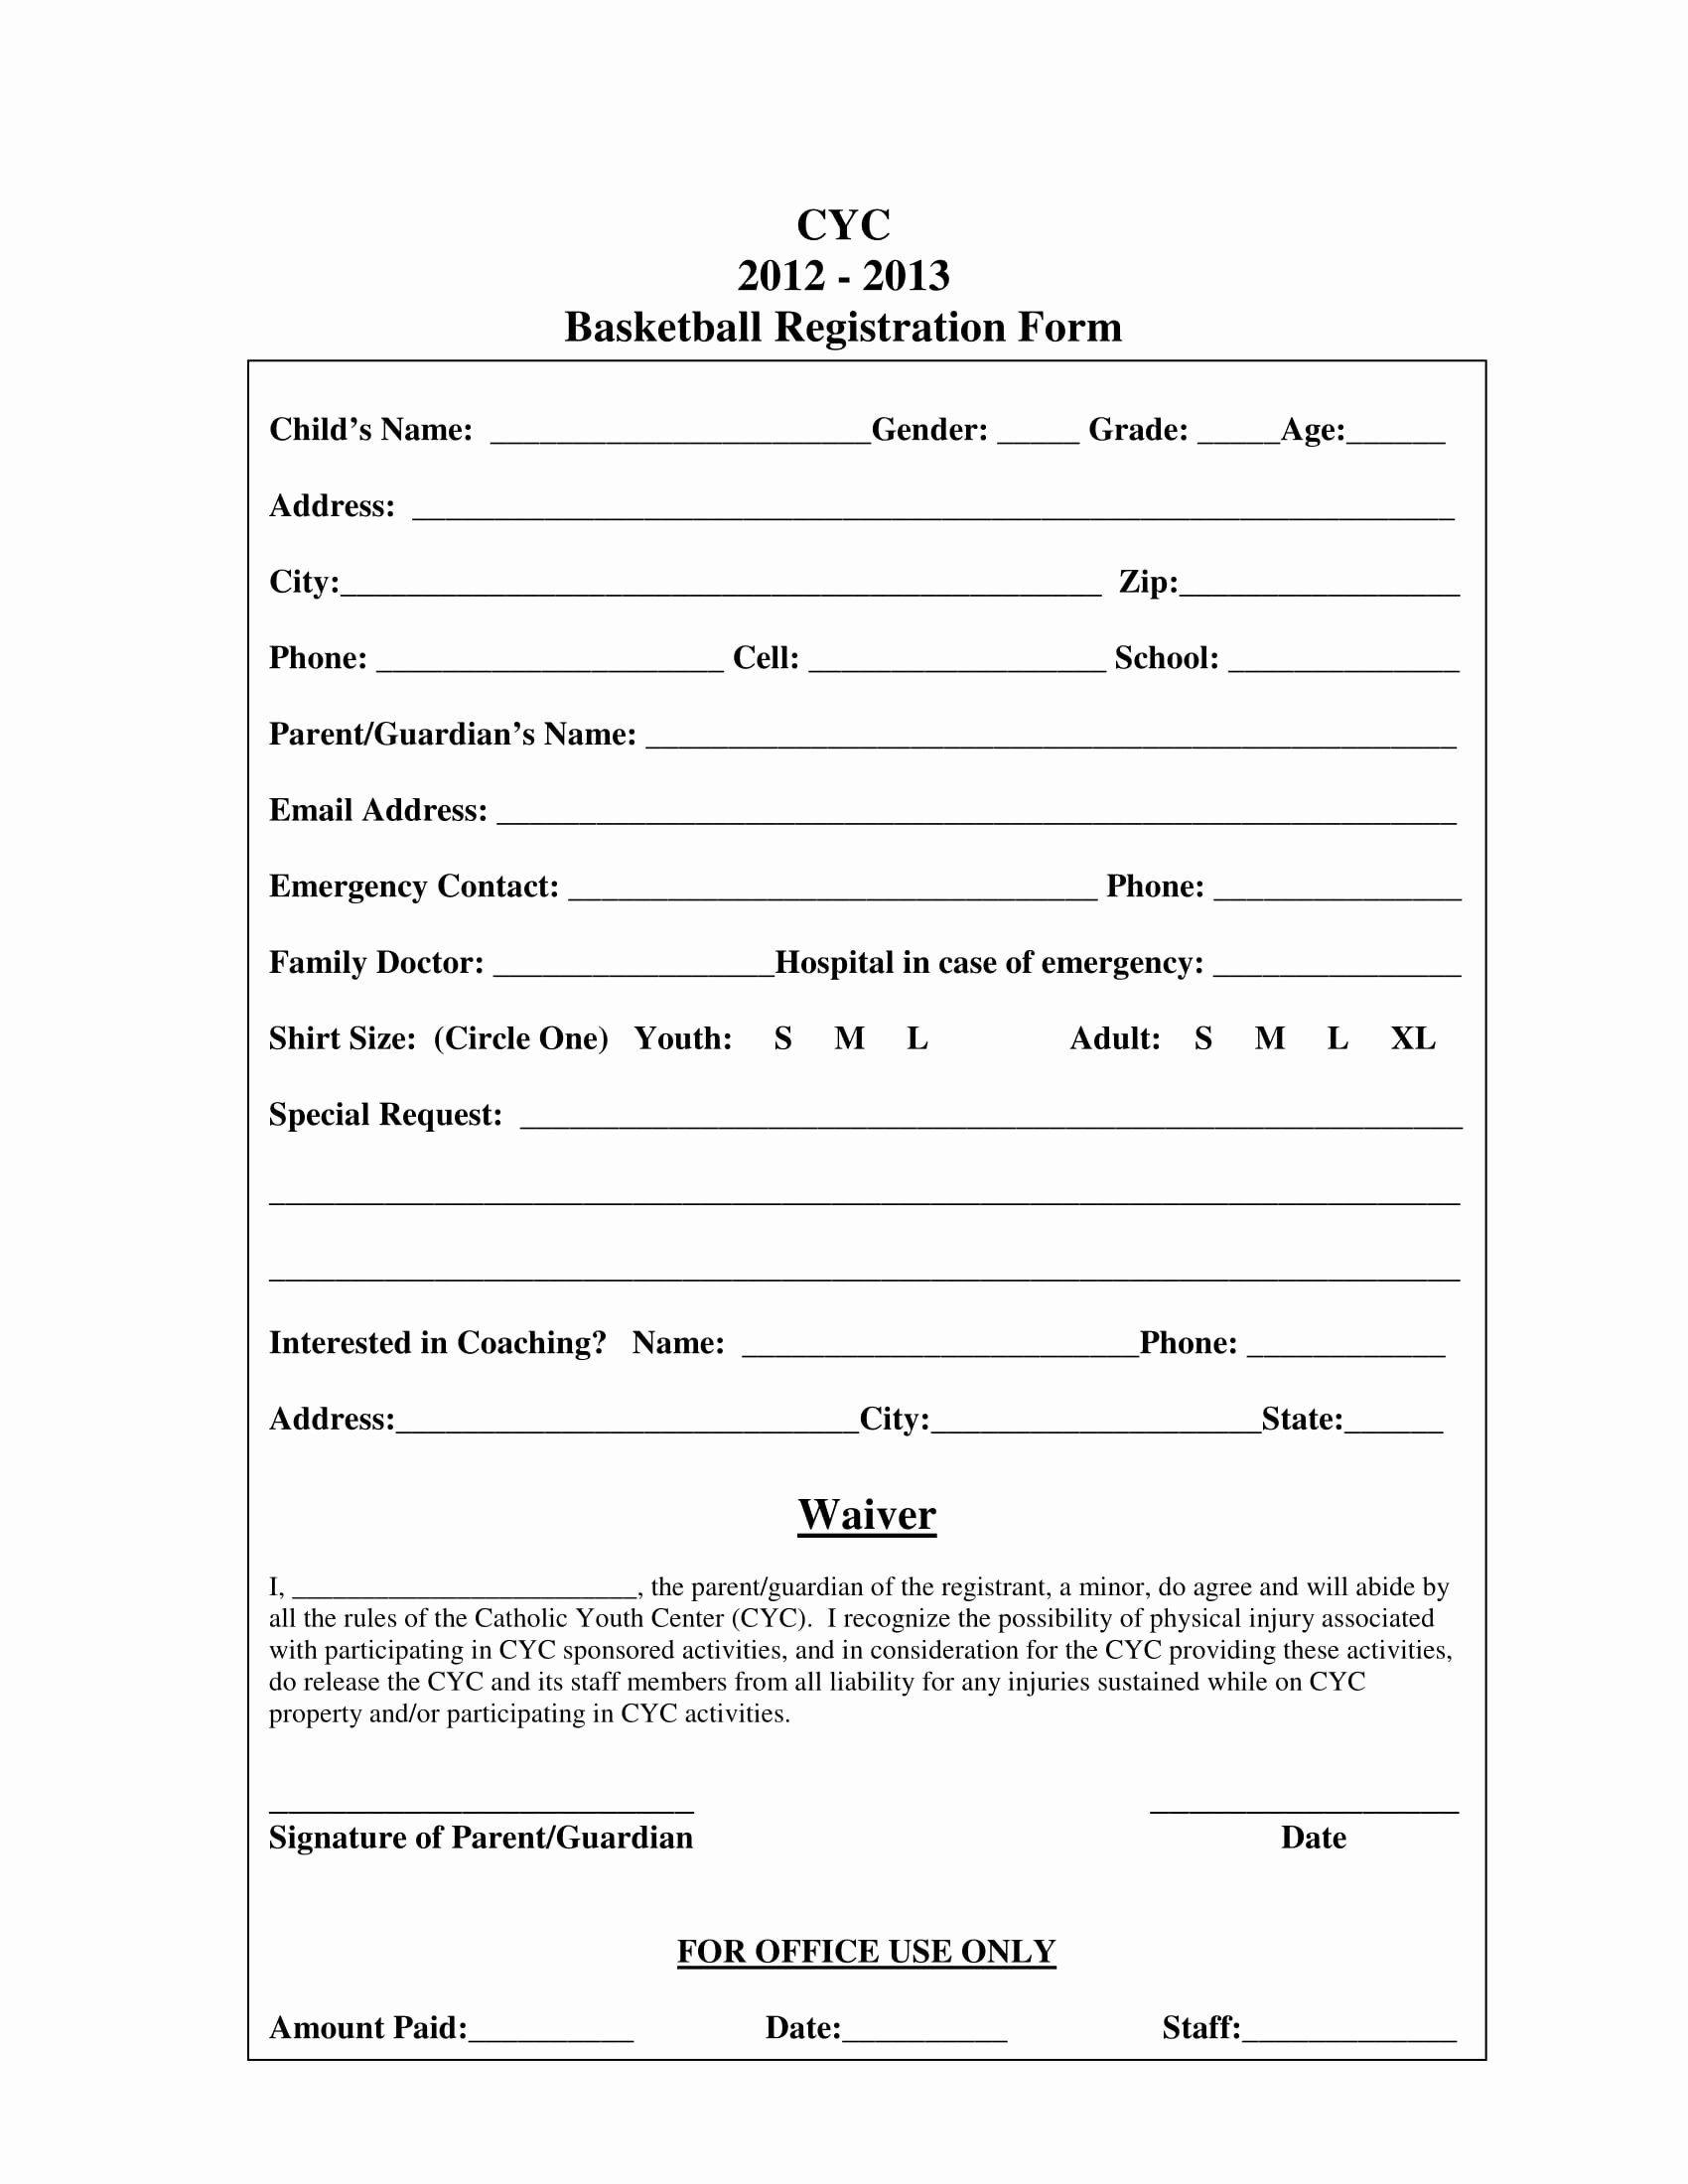 Basketball Tournament Registration Form Template New 10 Basketball Registration Form Samples Registration Form Sample Registration Form Professional Templates